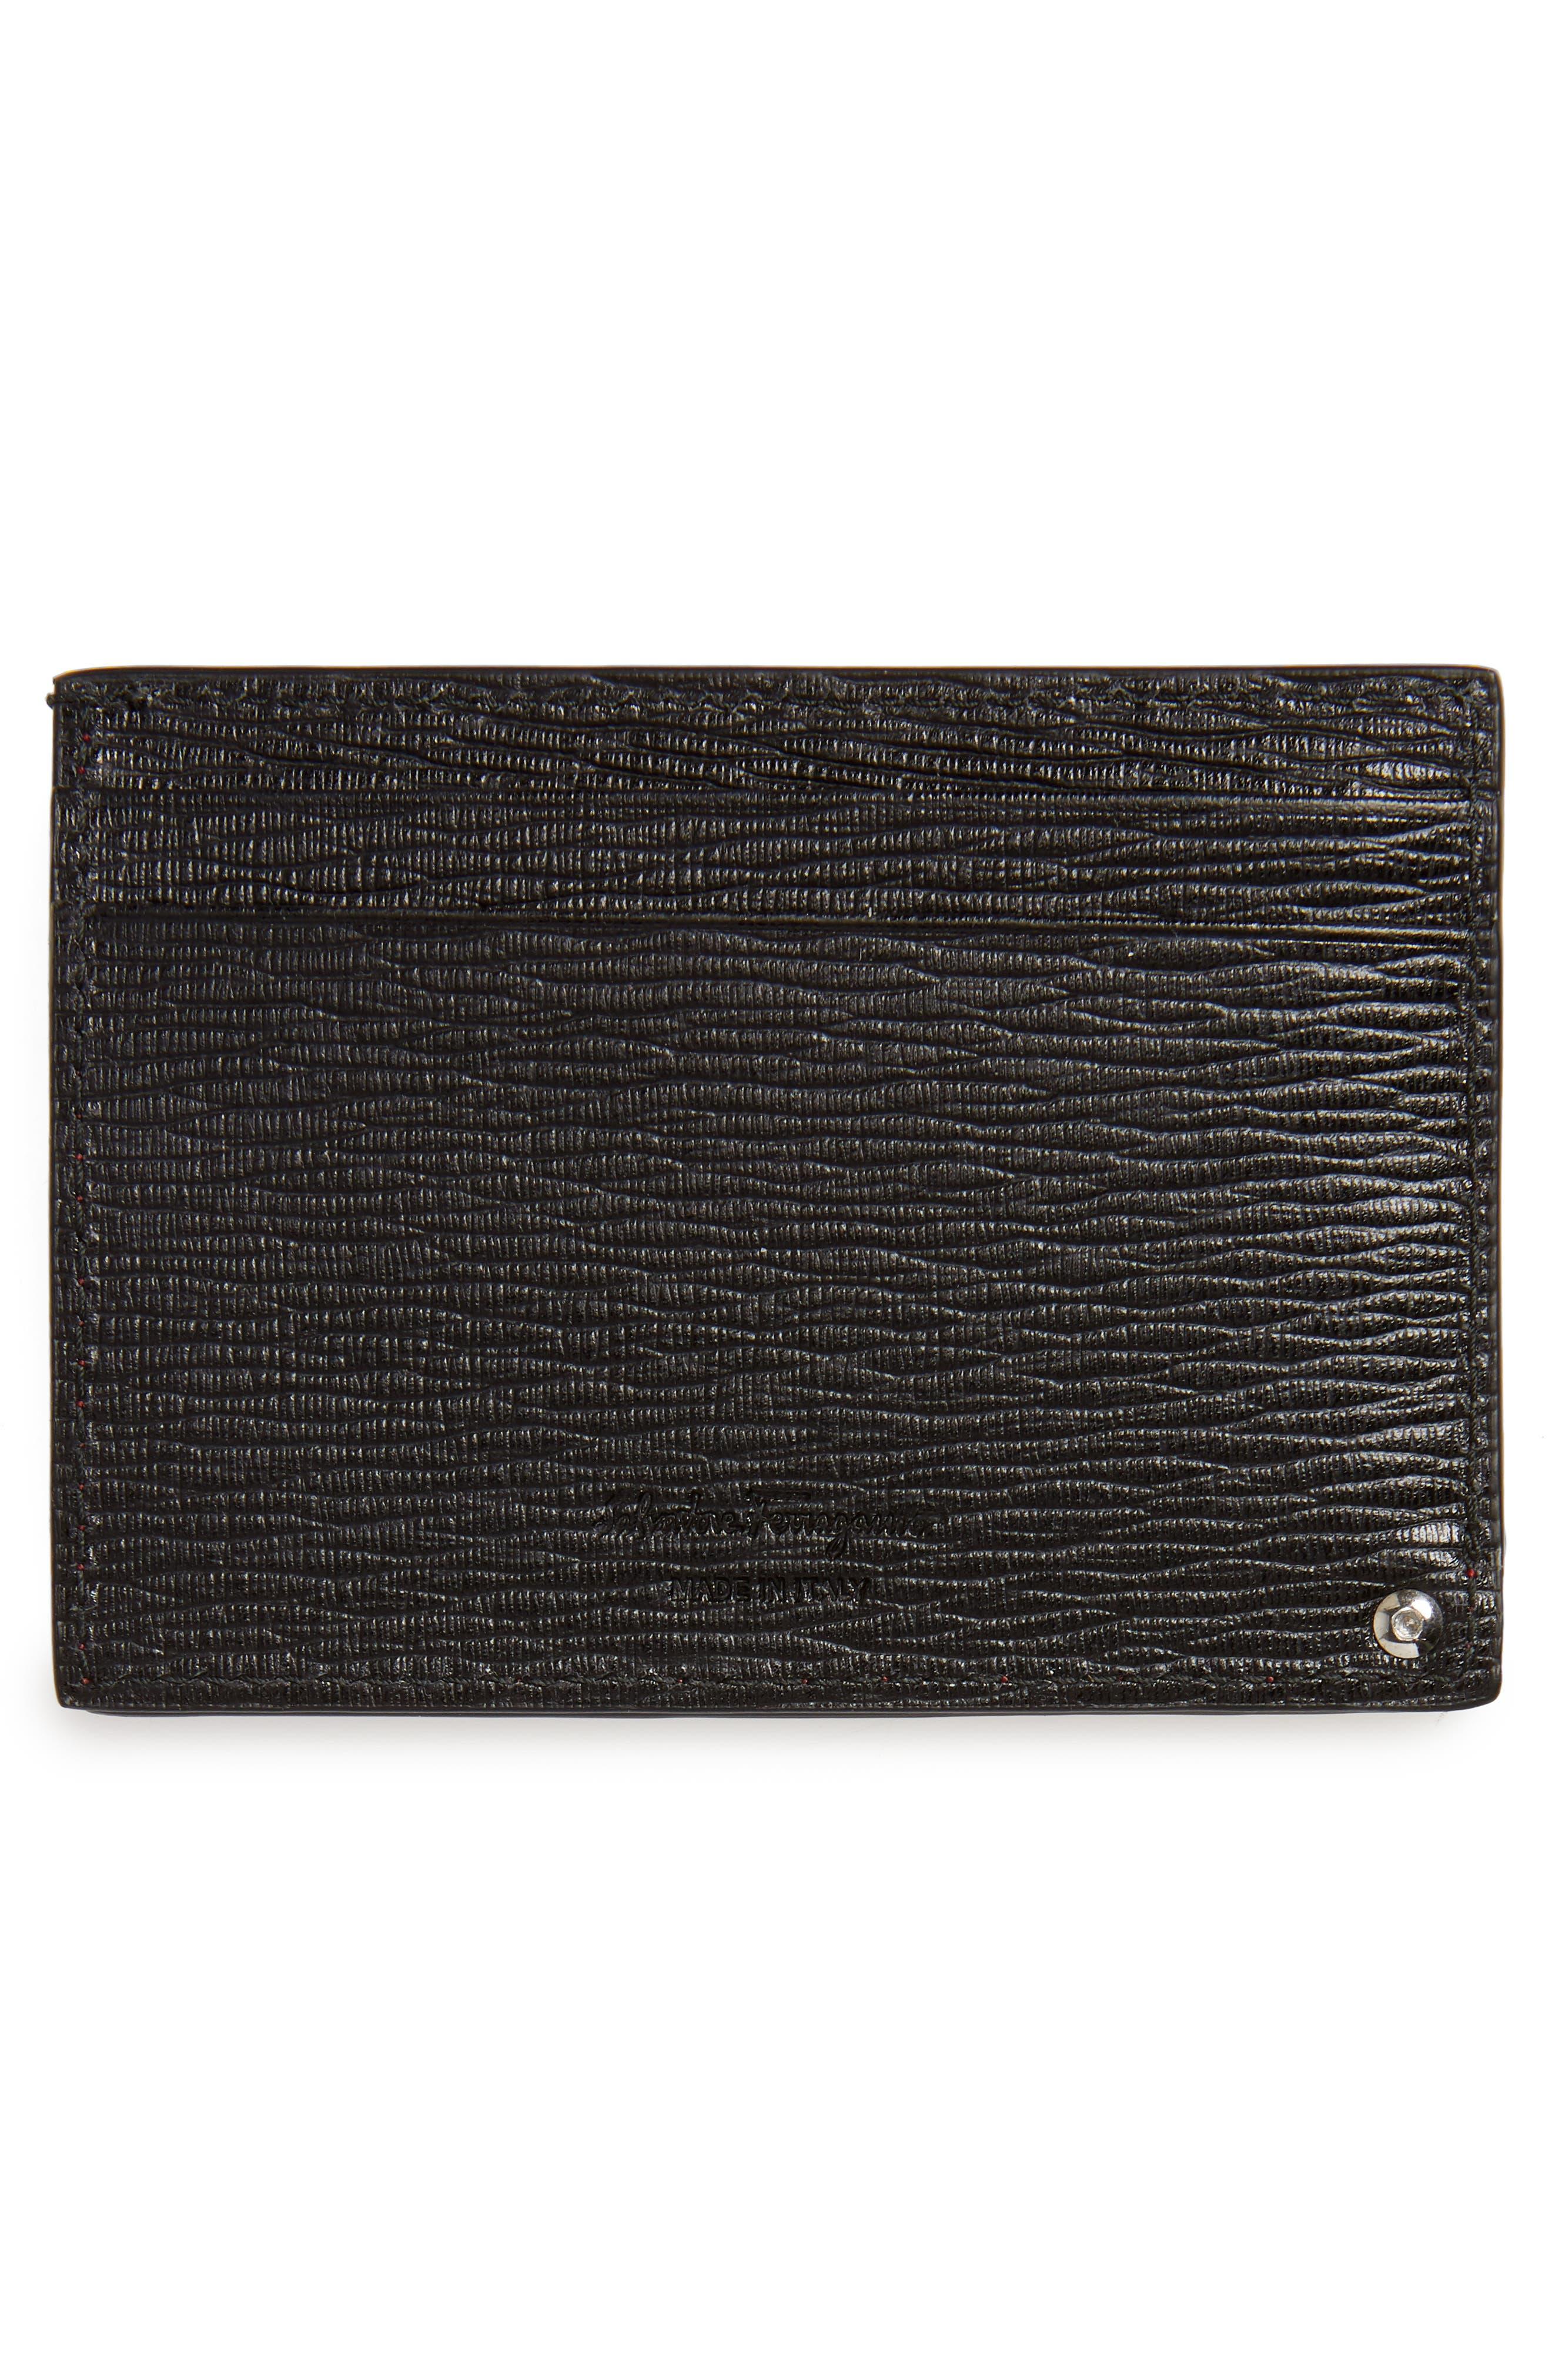 Revival Calfskin Leather Card Case,                             Alternate thumbnail 2, color,                             Black